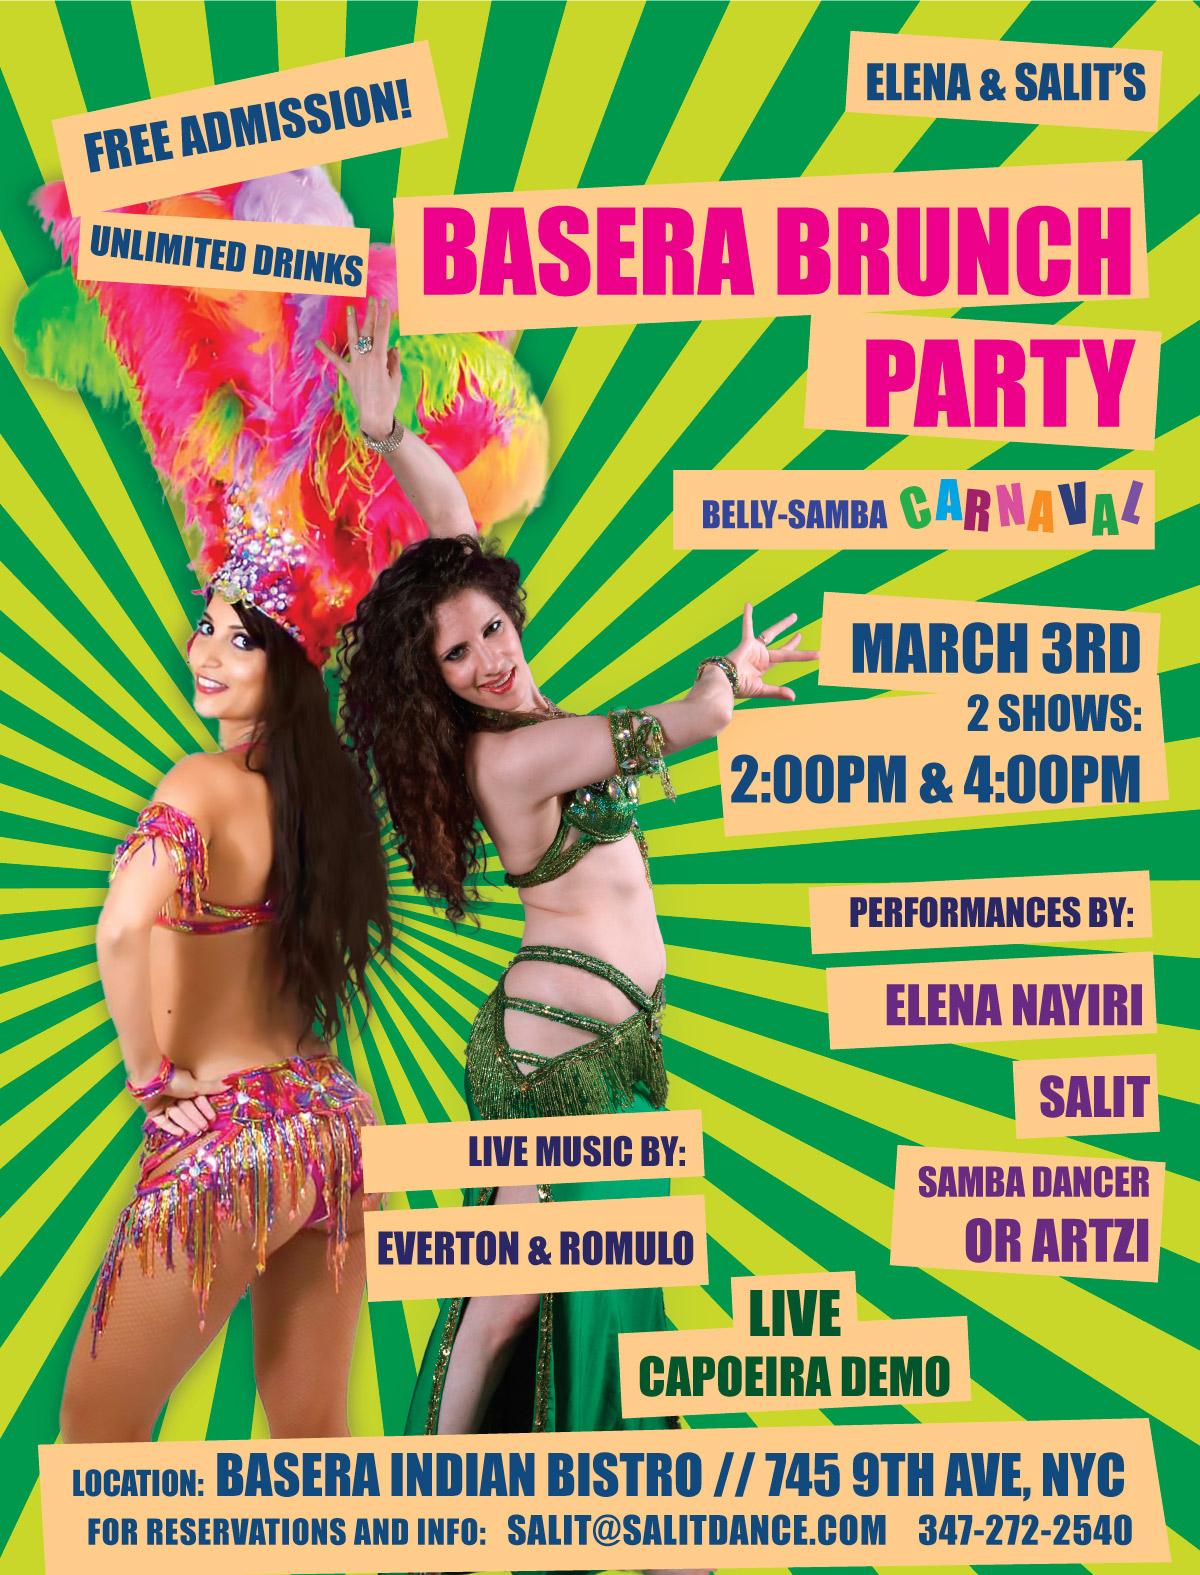 belly-samba event flyer